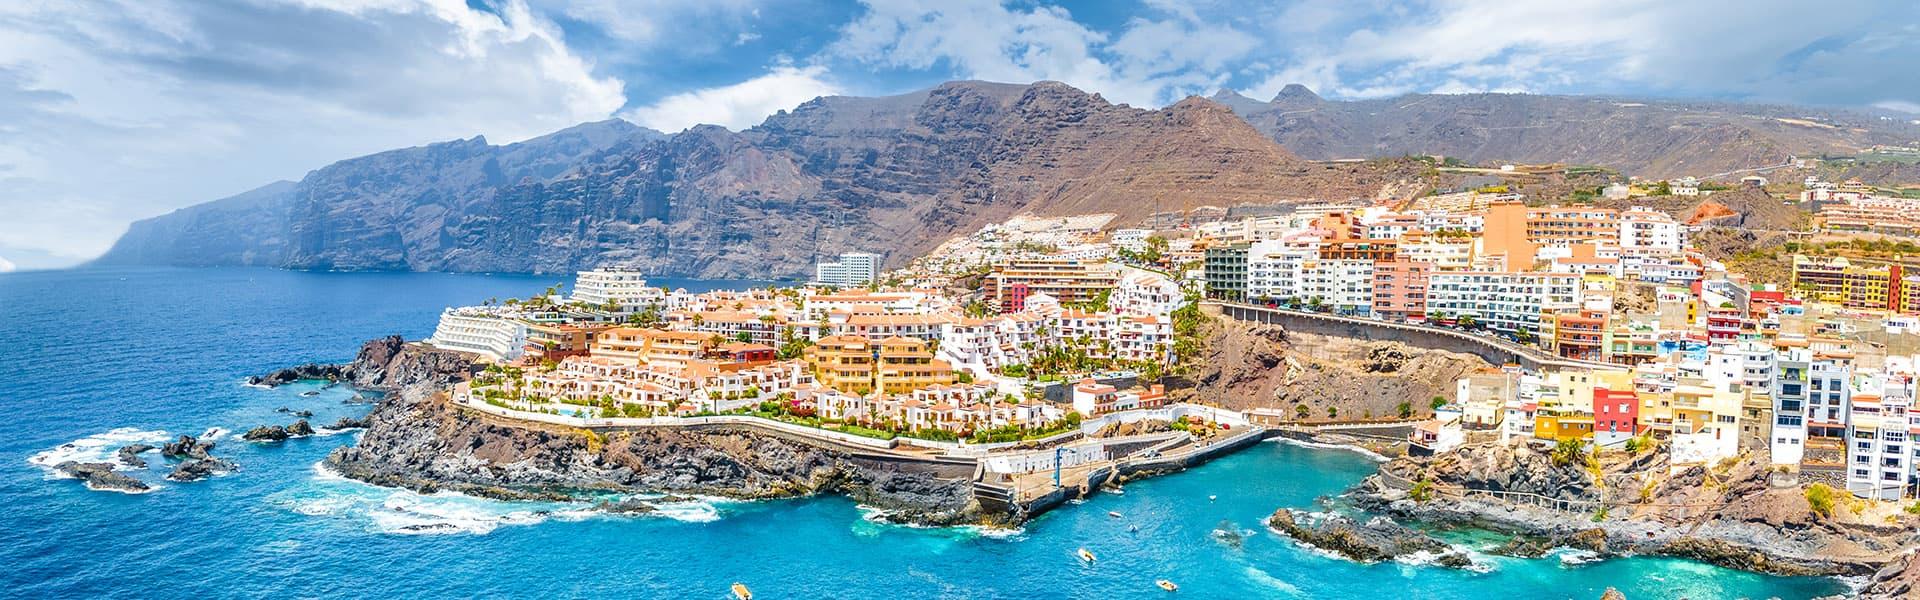 Mediterranean: Azores, Canary Islands & Madeira